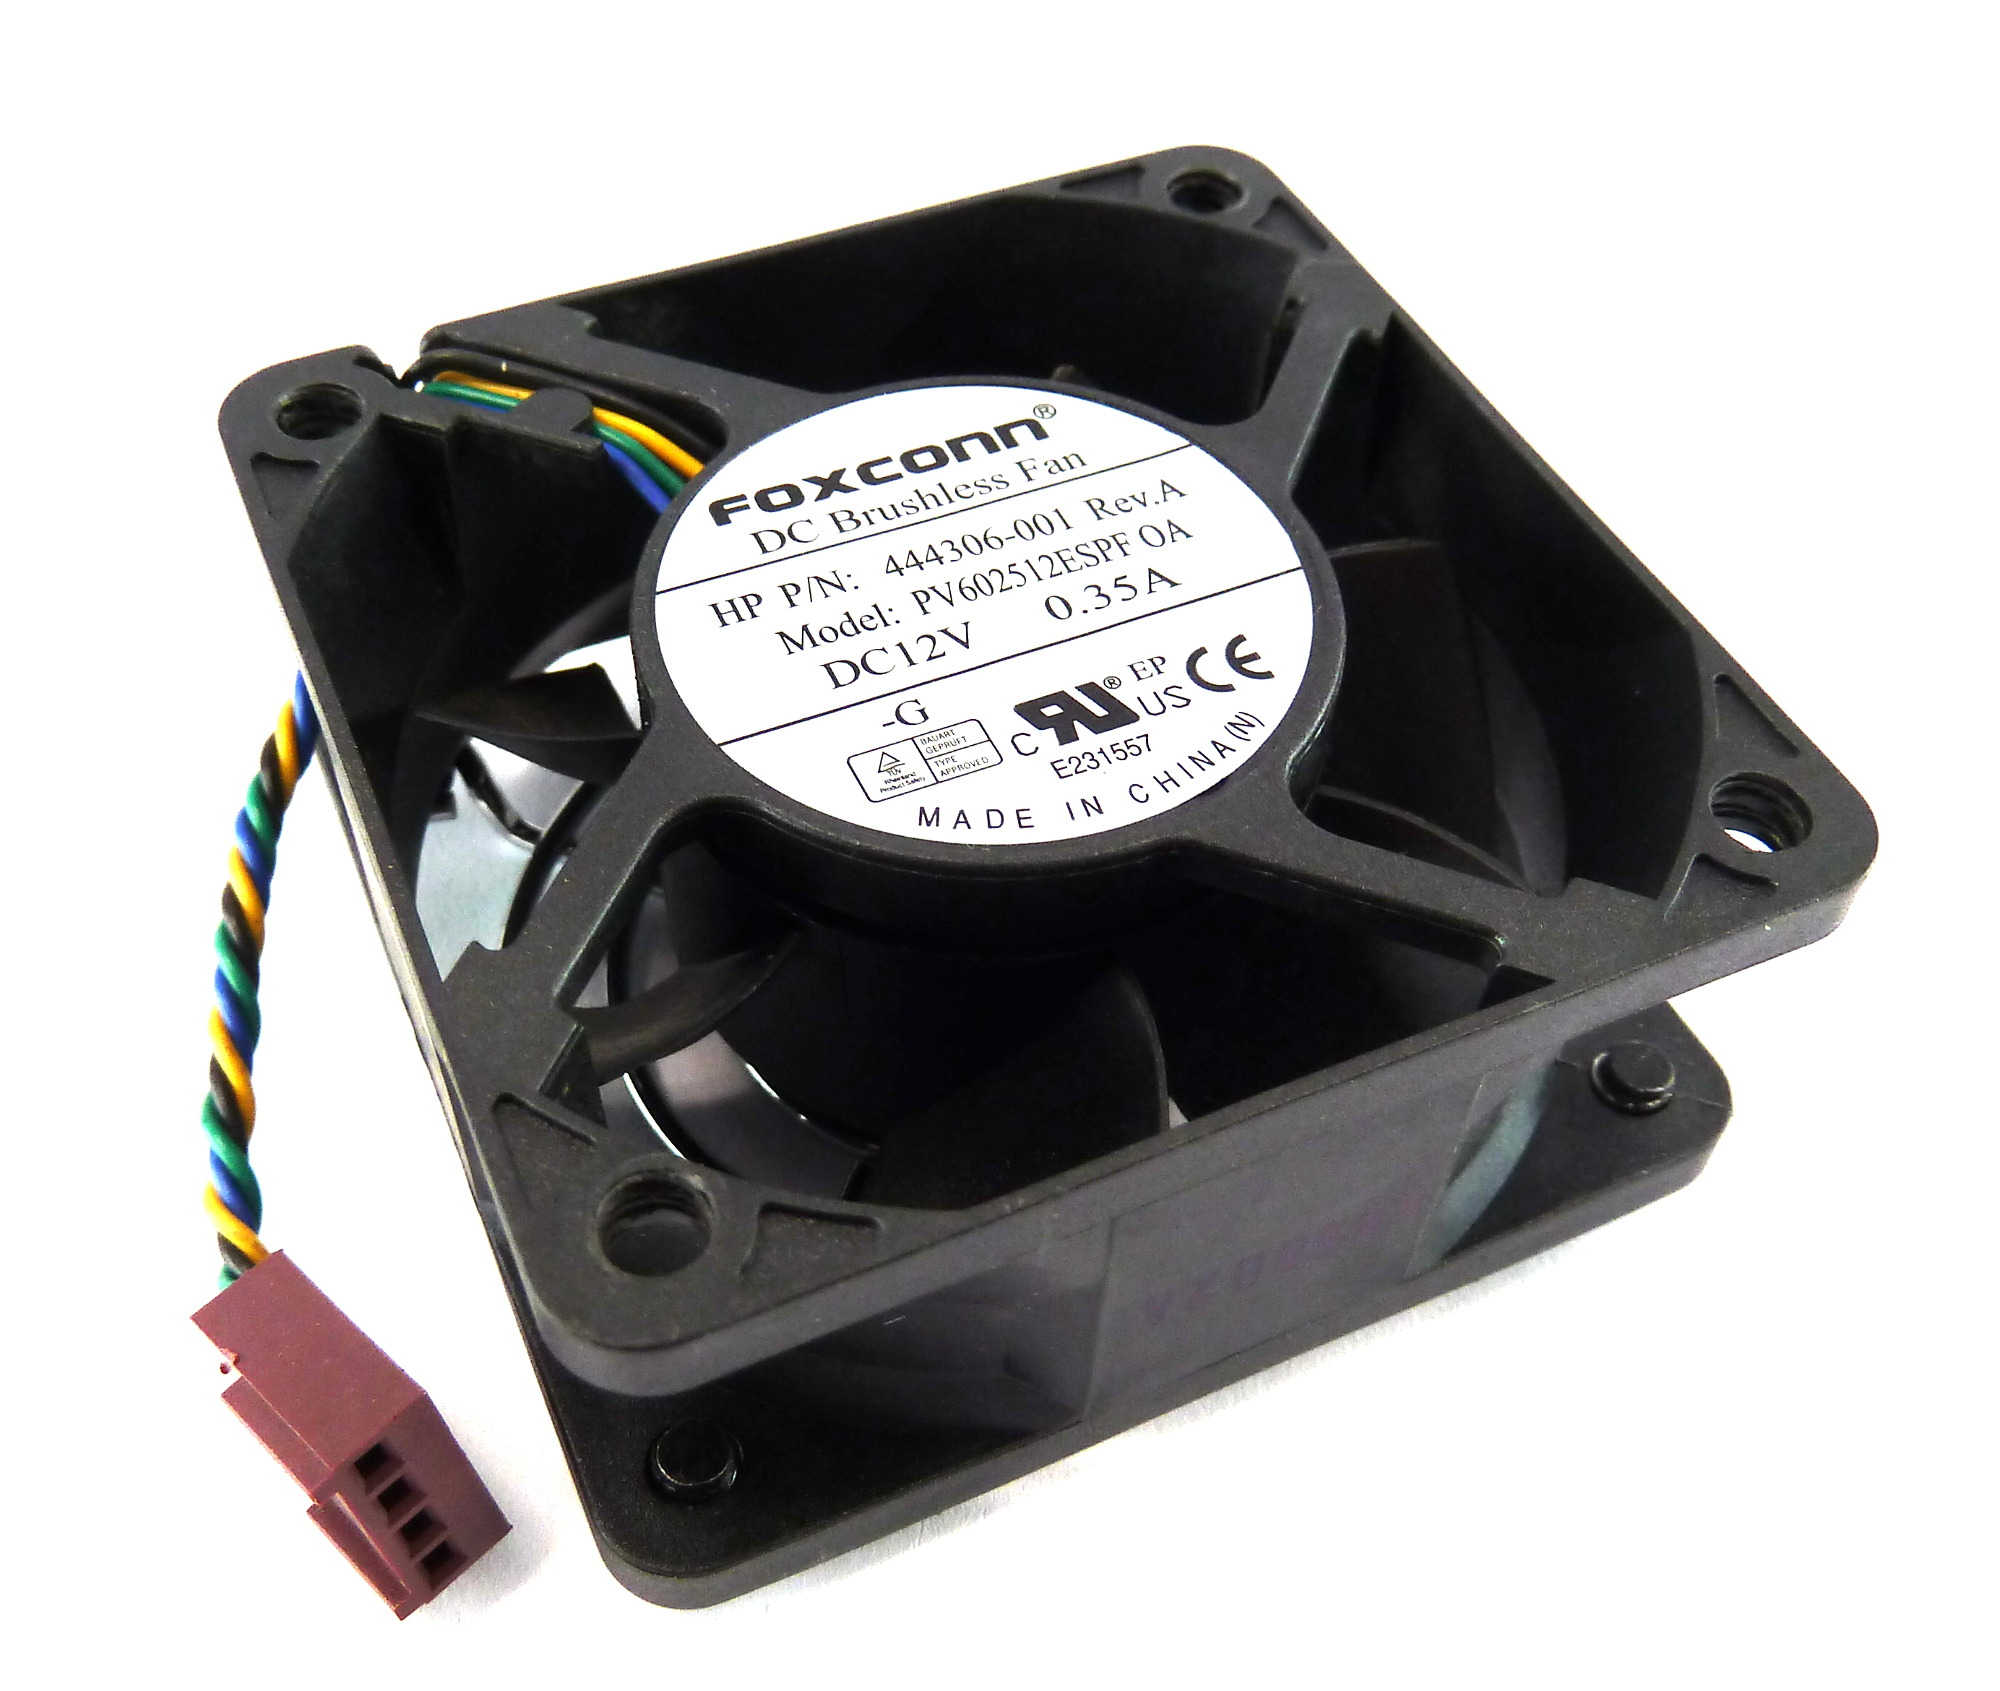 Вентилатор  60x60x25mm Foxconn PV602512ESPF 0A